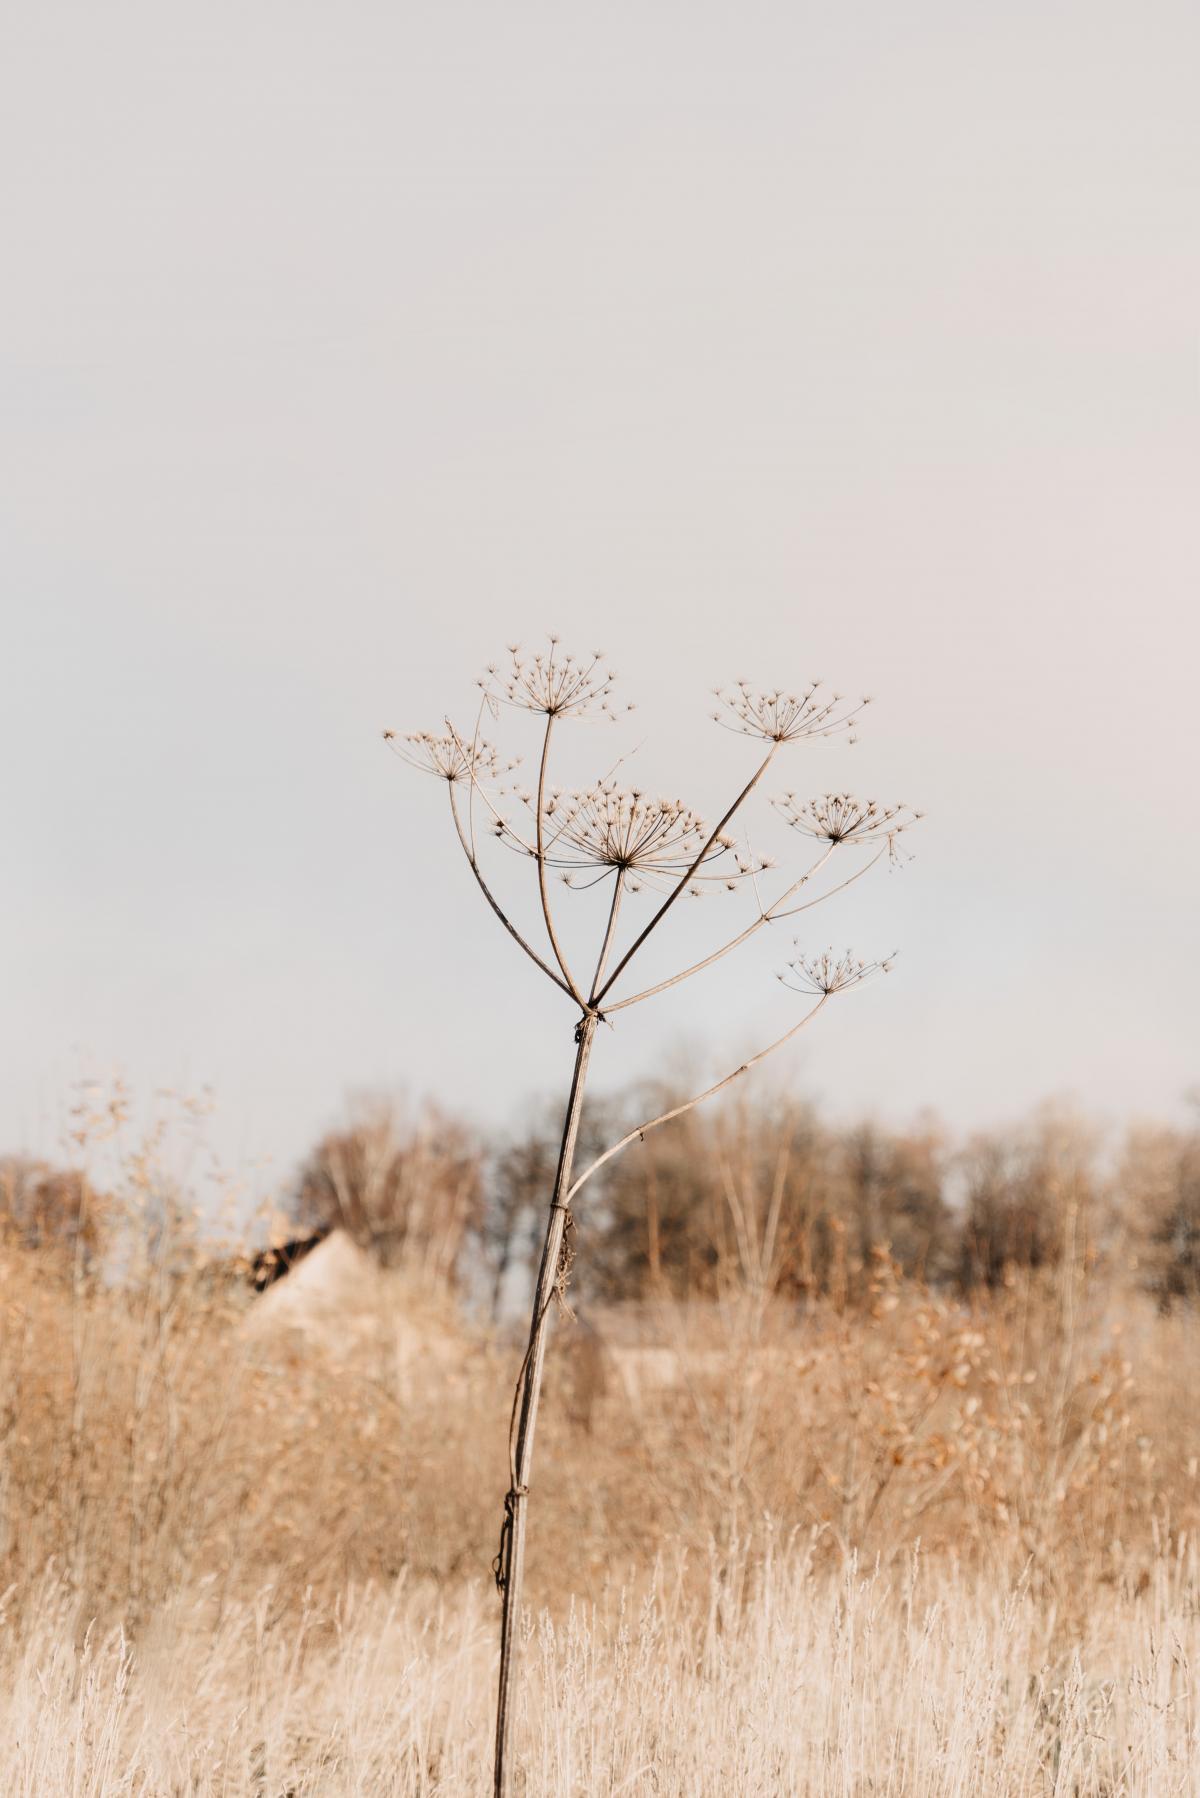 Tree Herb Vascular plant #424709